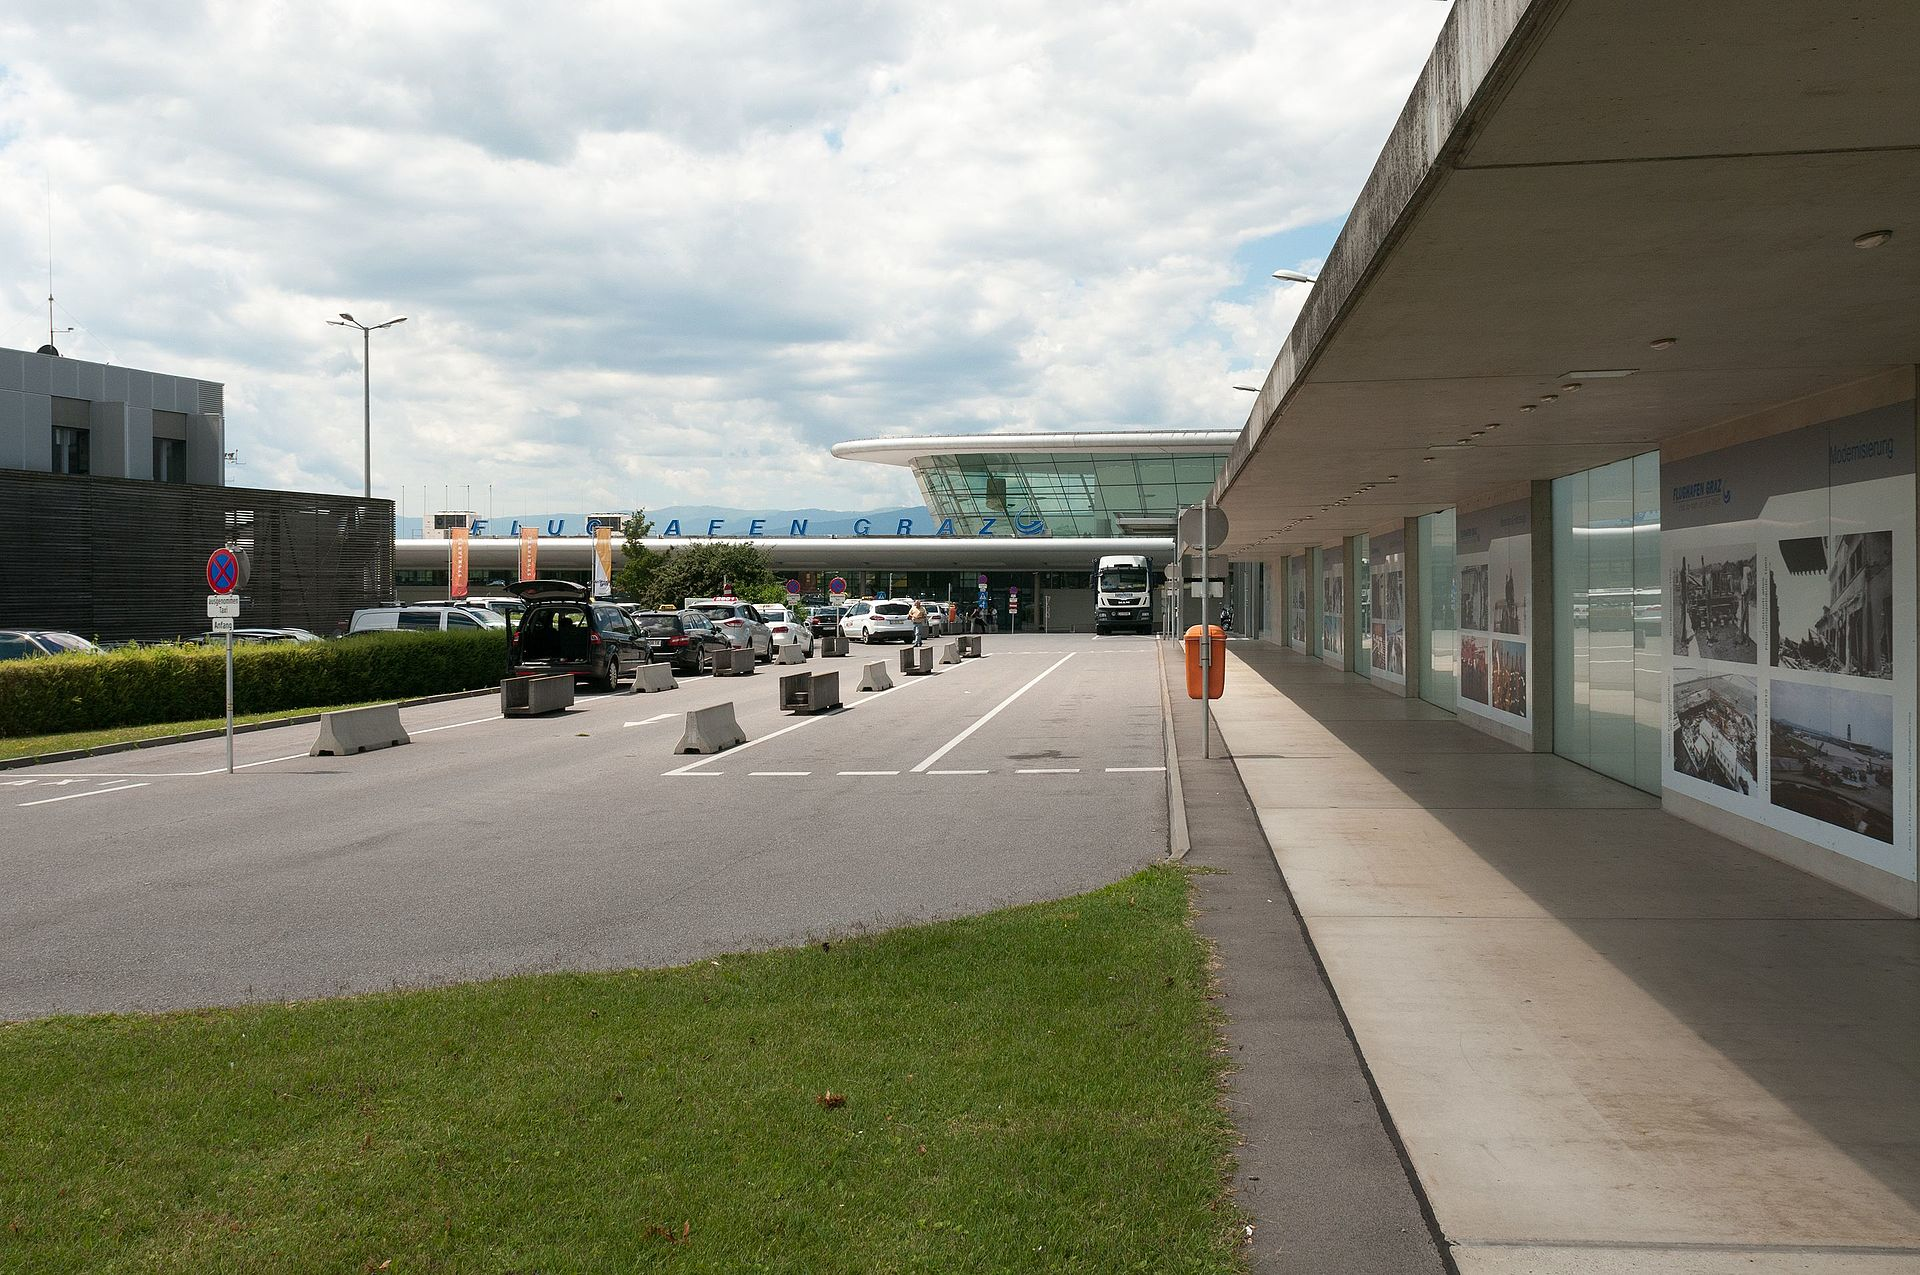 16-07-05-Flughafen-Graz-RR2_0341